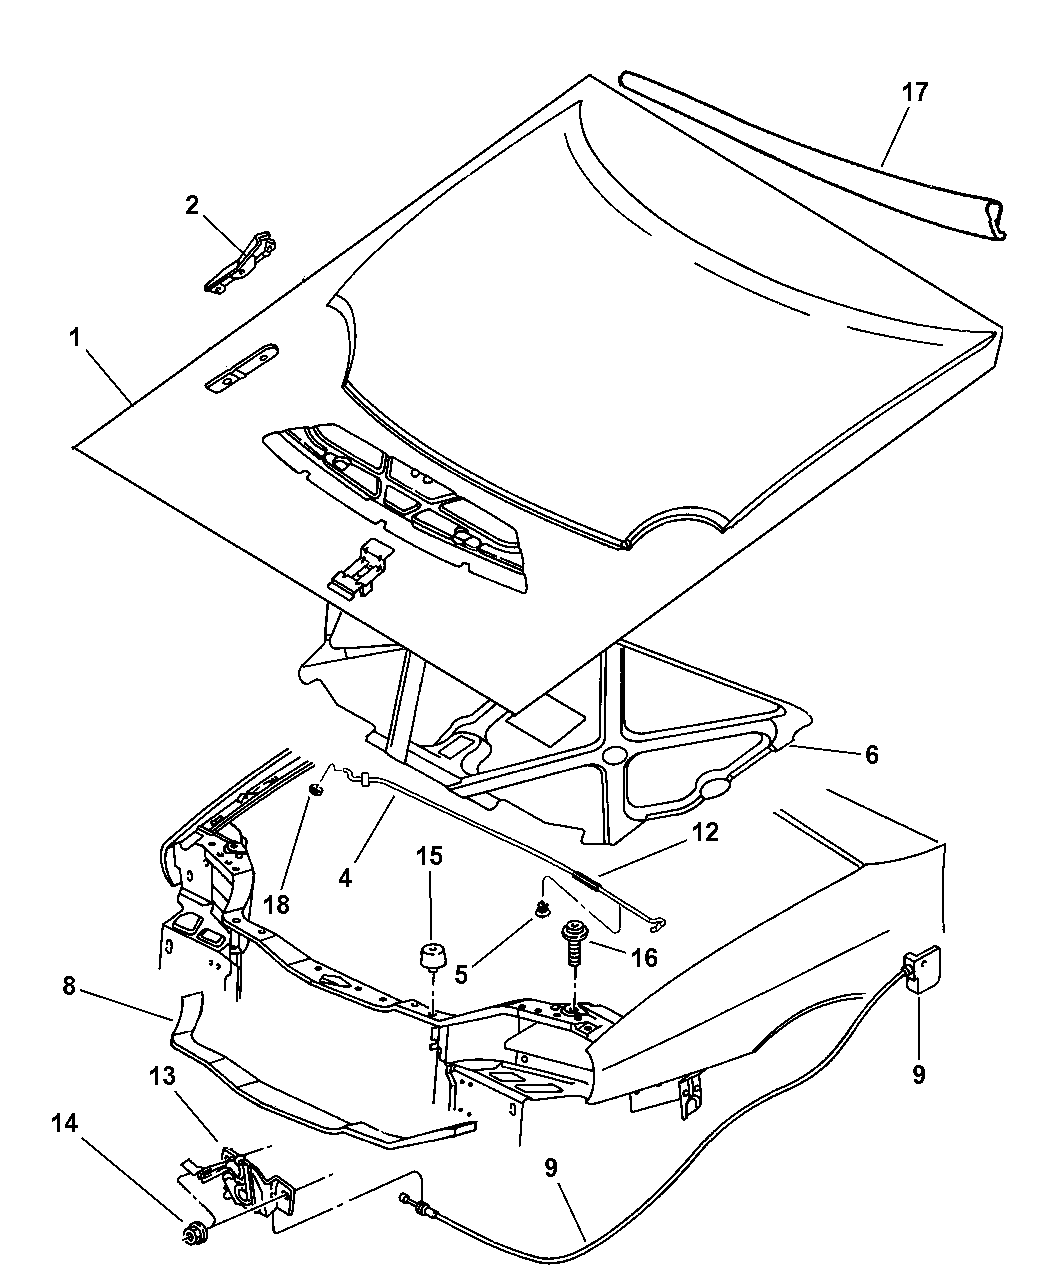 2005 Dodge Neon Belt Diagram Car Tuning